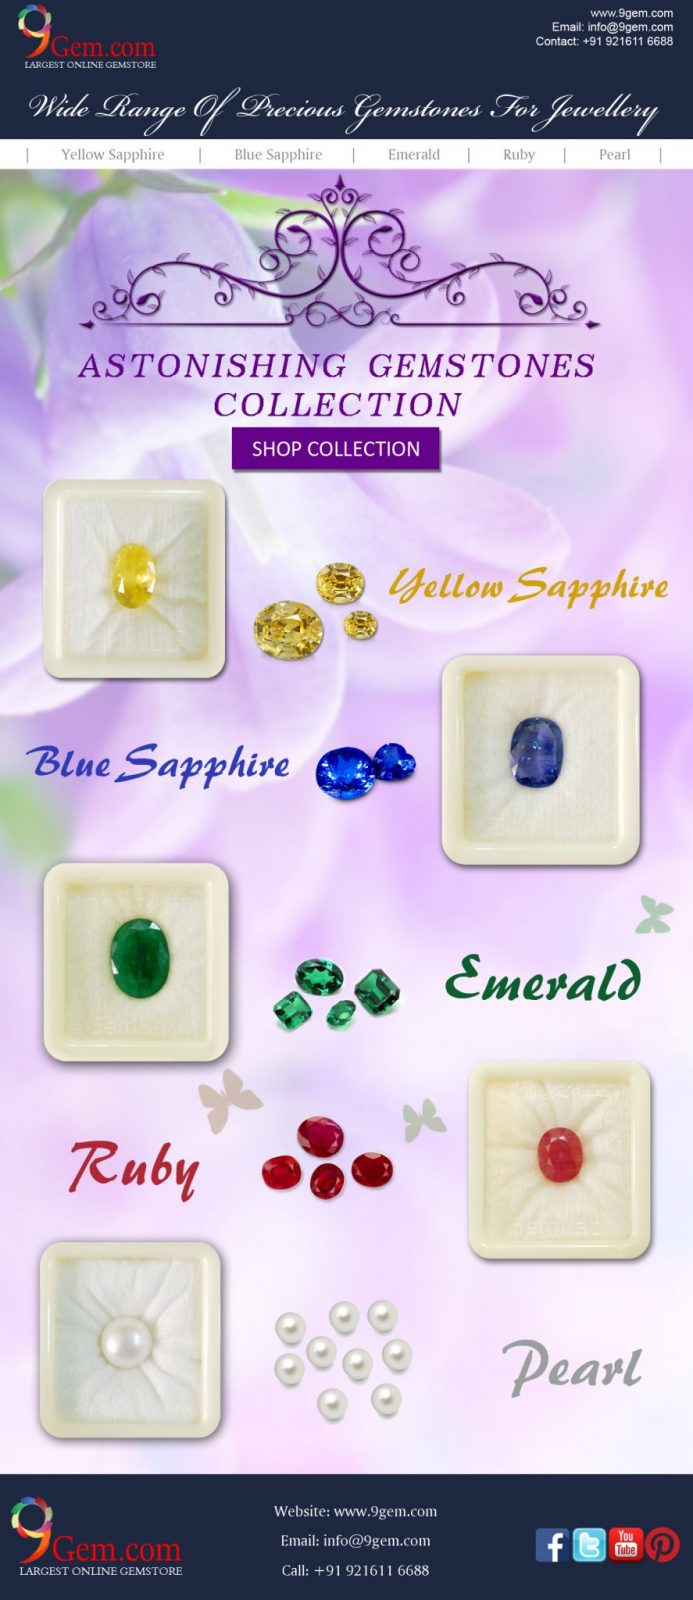 precious gemstone collection at 9Gem